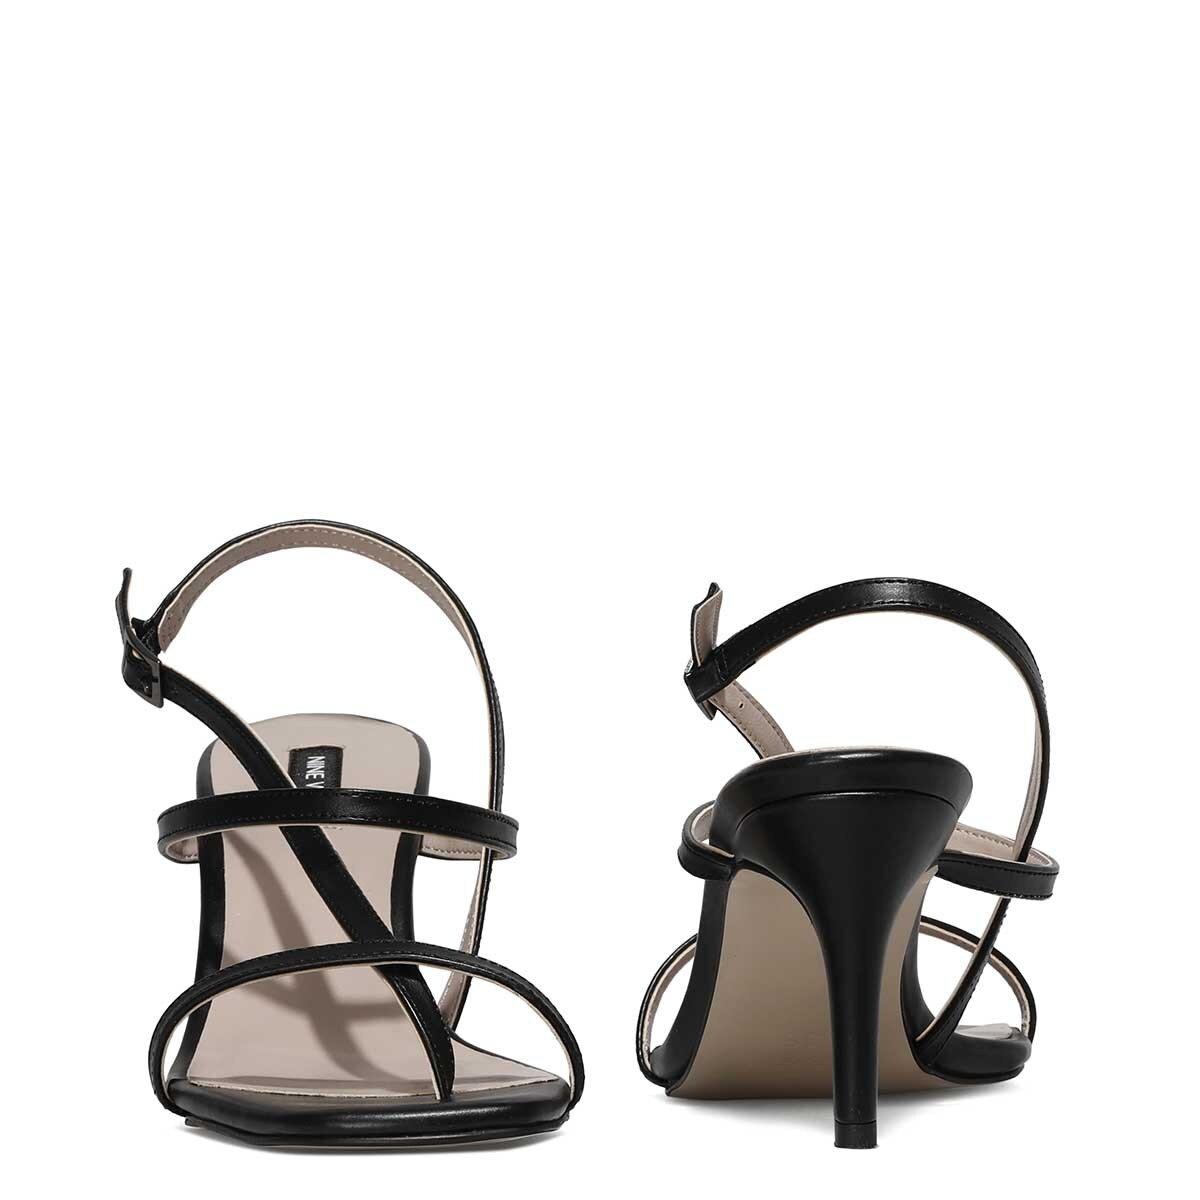 HEA 1FX Siyah Kadın Topuklu Sandalet